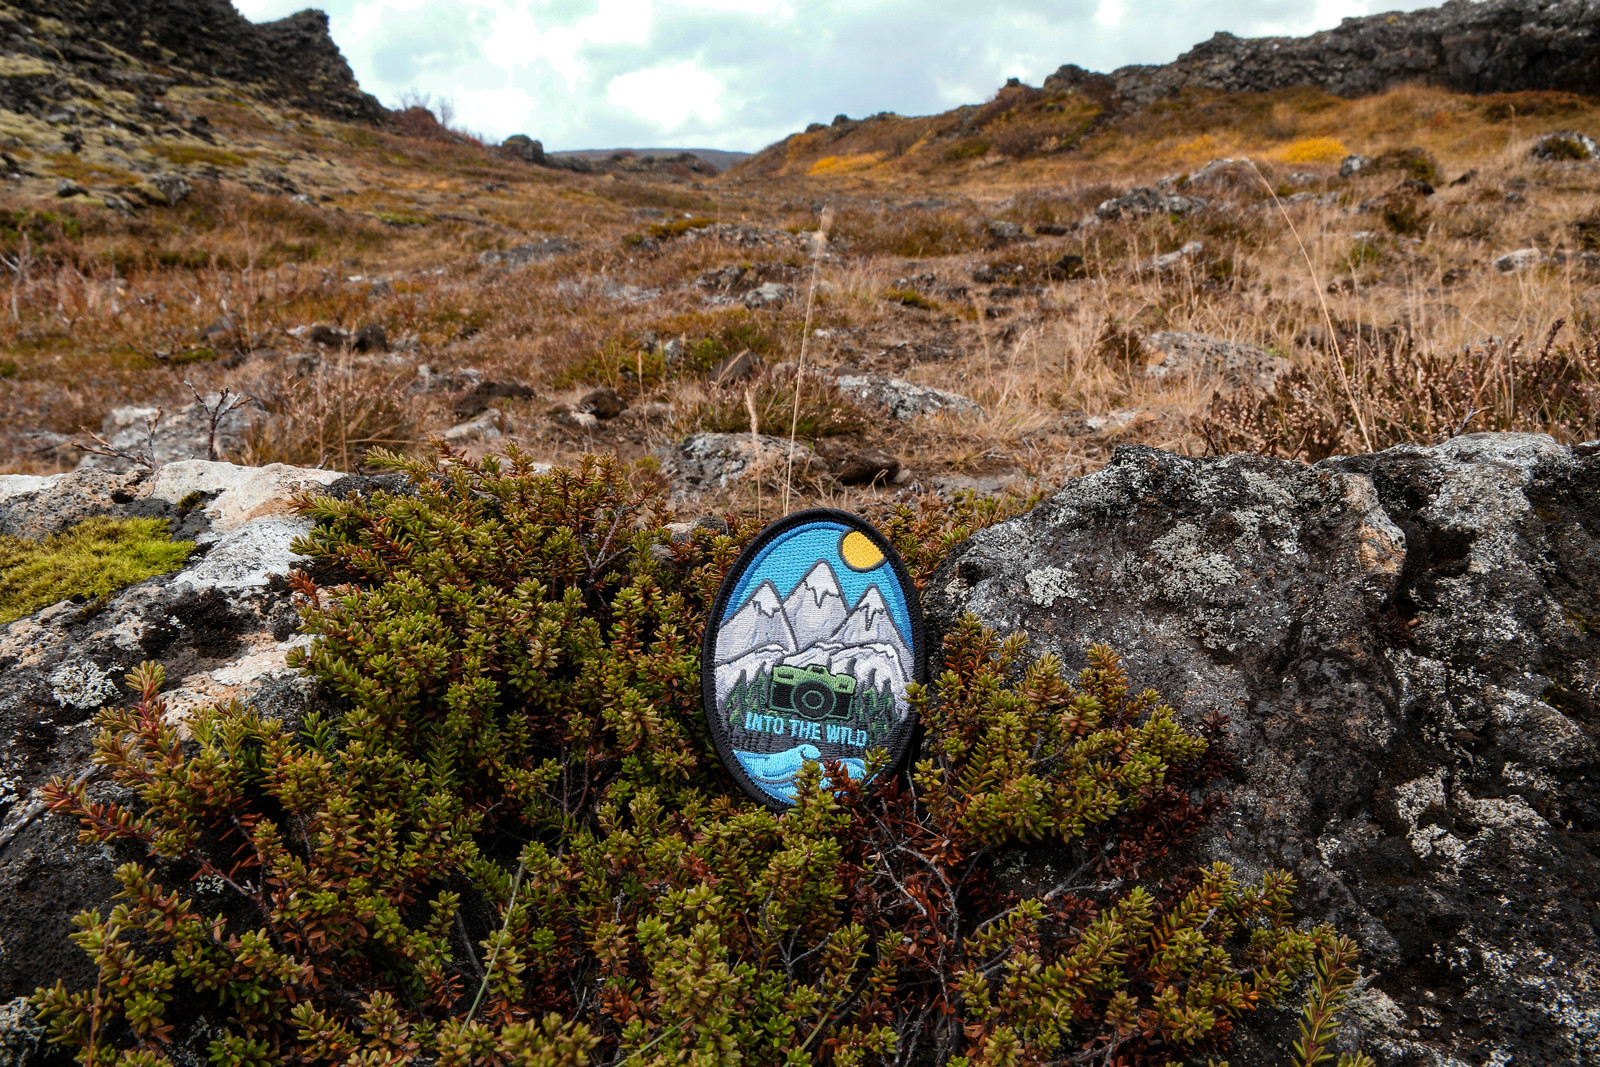 Into The Wild Patches at Búrfellsgjá